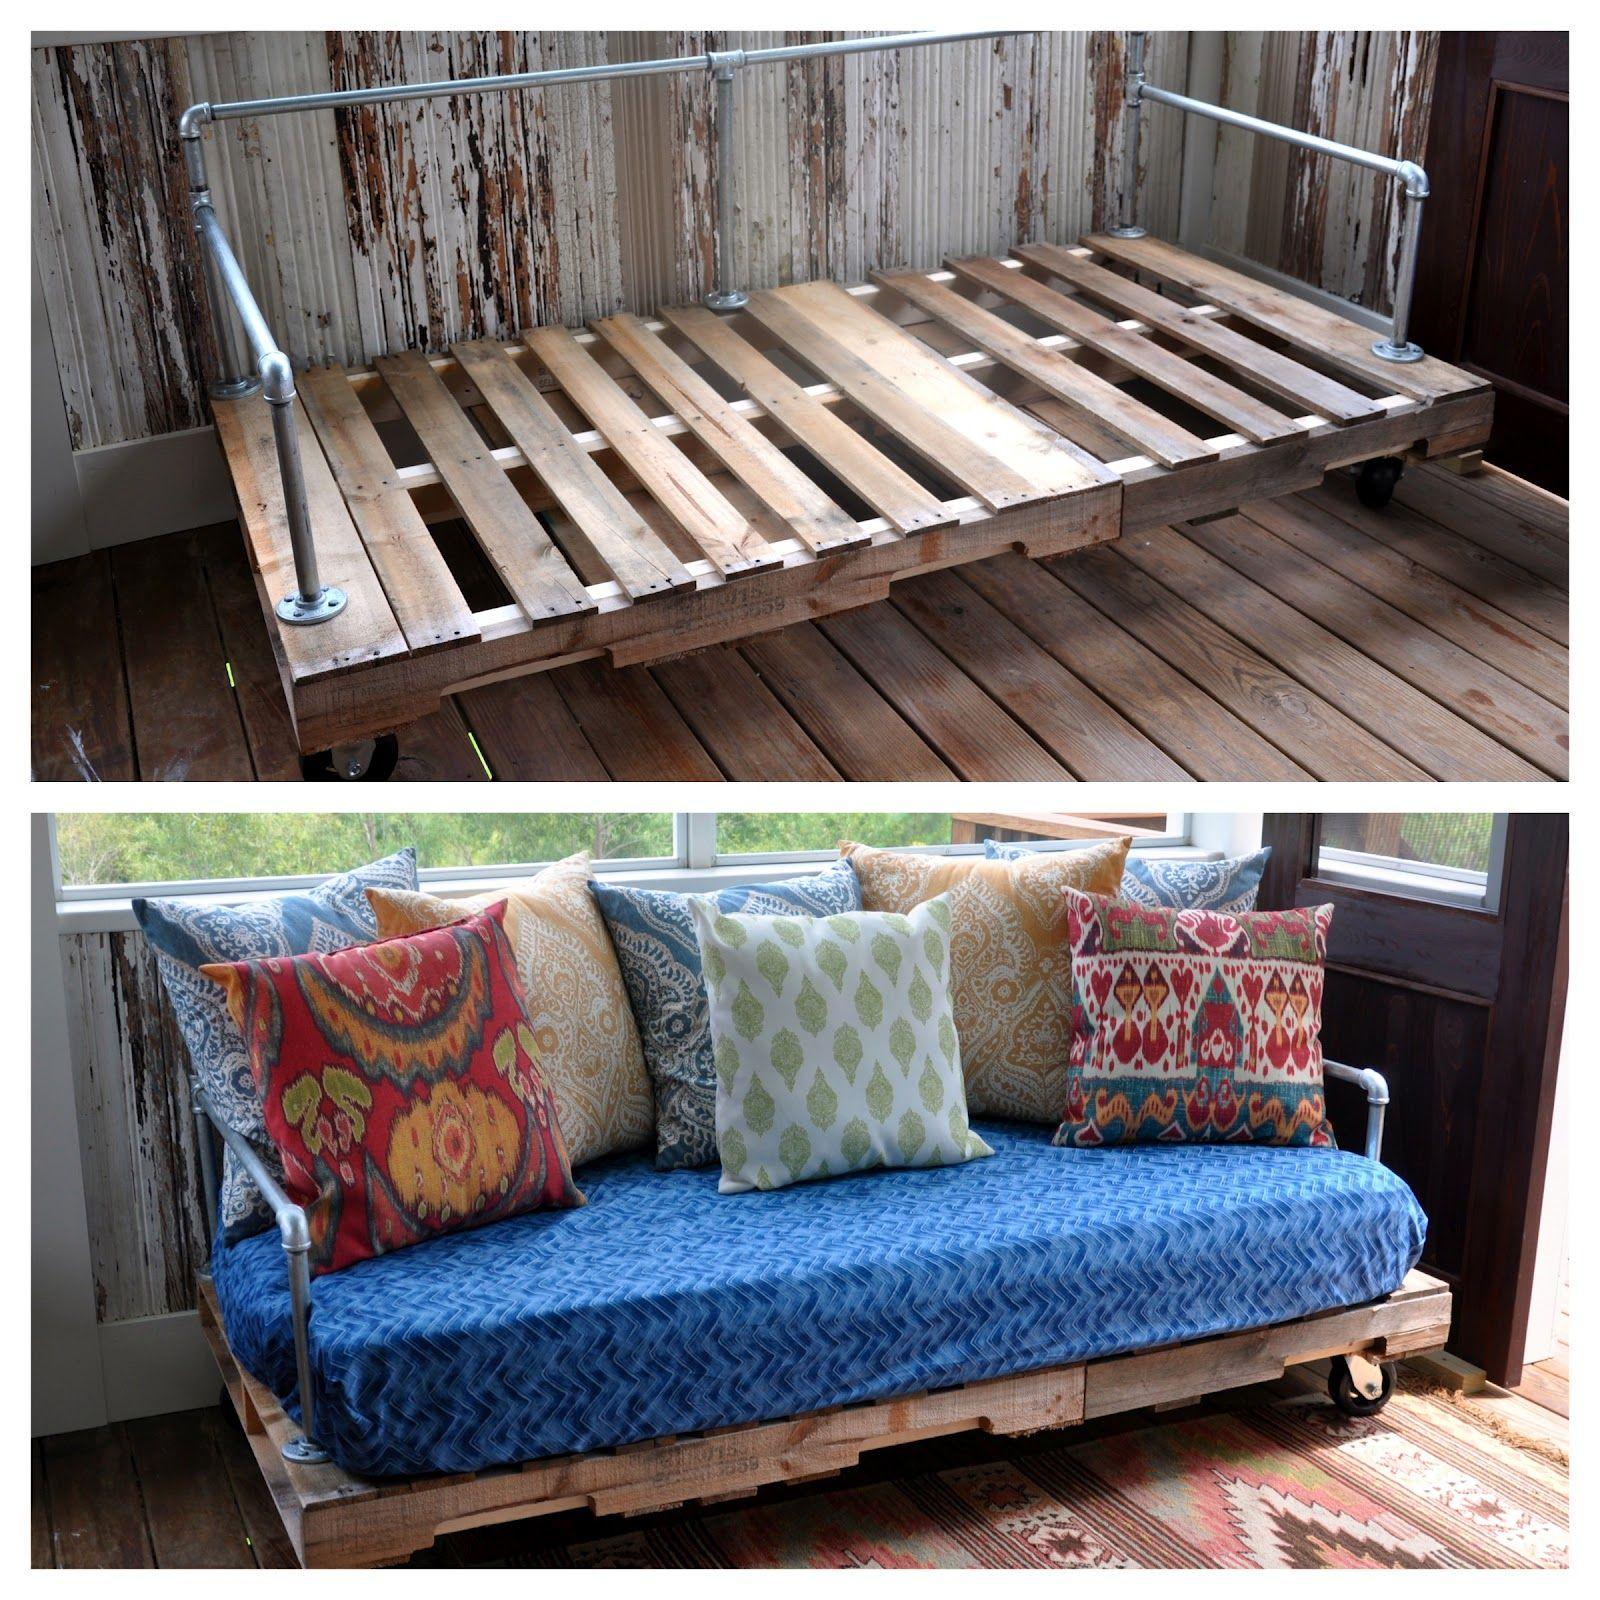 Hanging outdoor pallet bed Crafts Pinterest